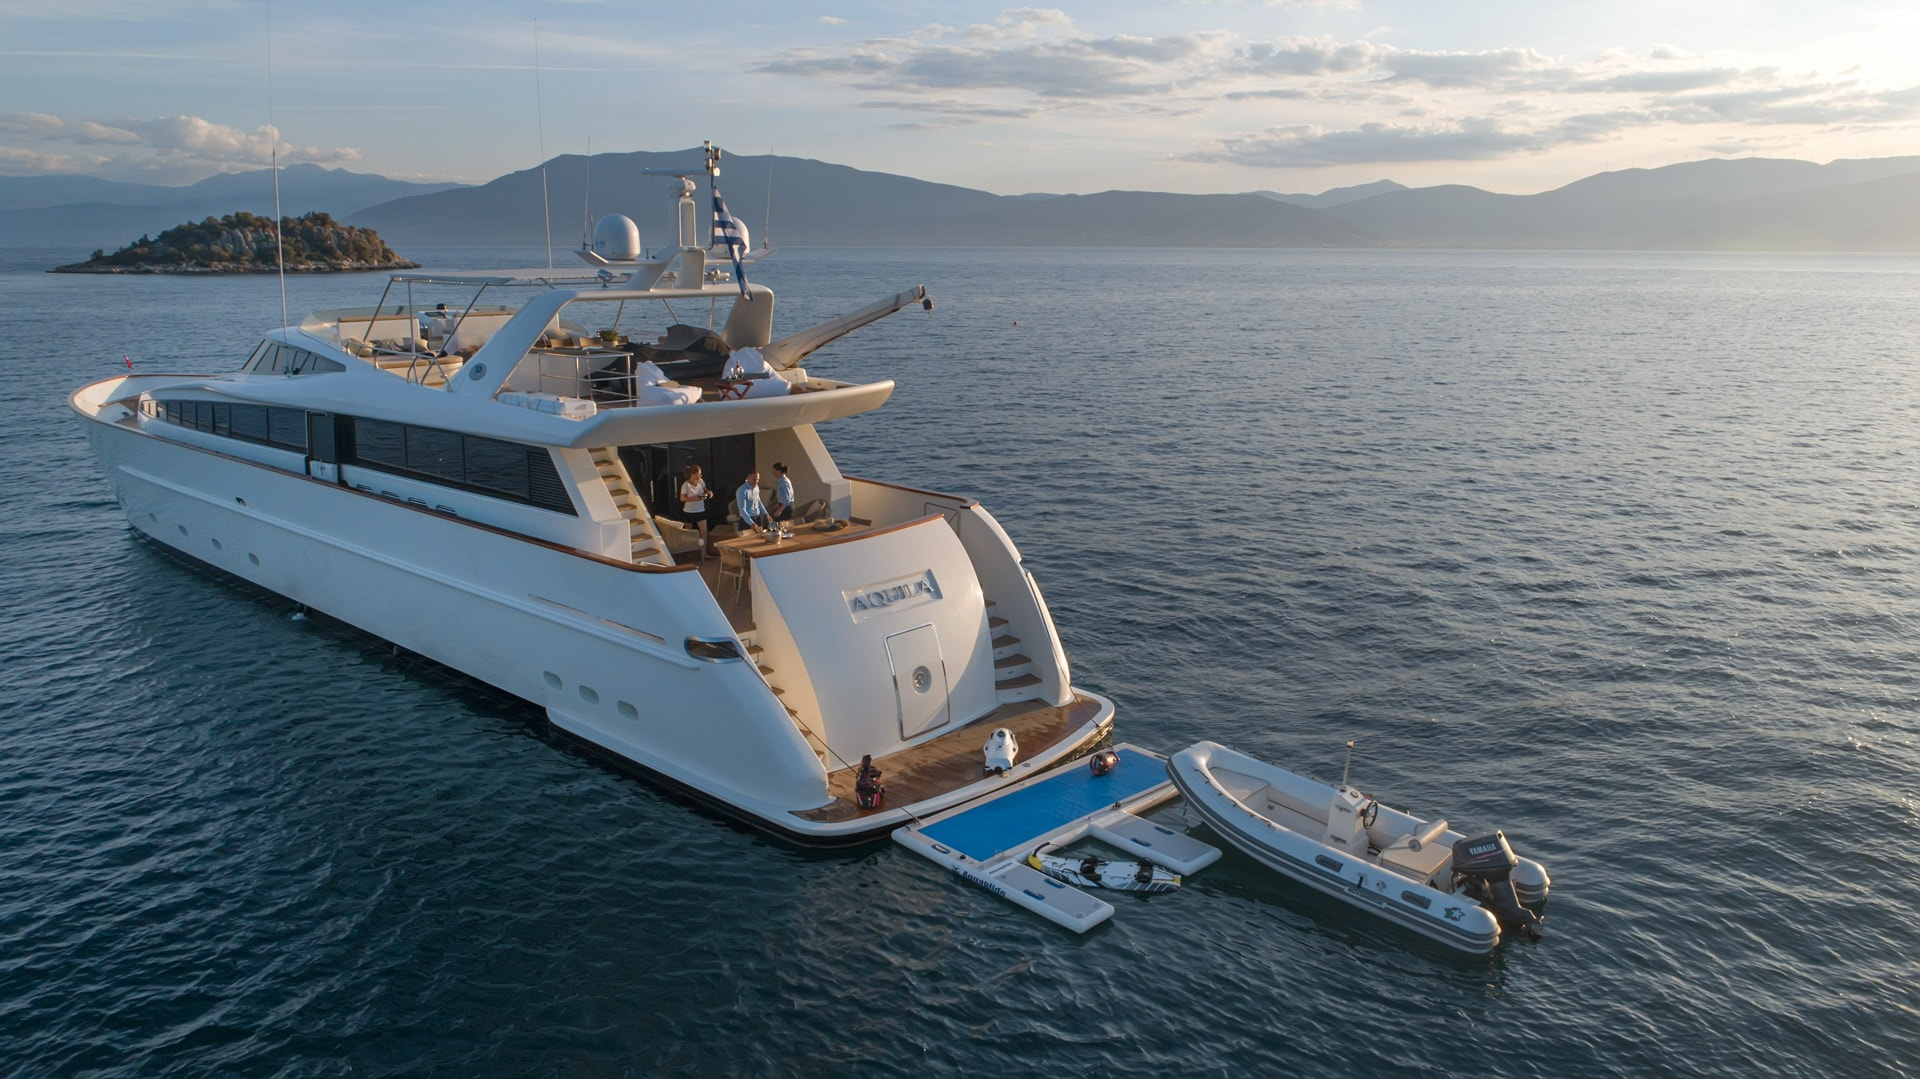 secret islands aquila yacht charter valef yachts min - Valef Yachts Chartering - 0734